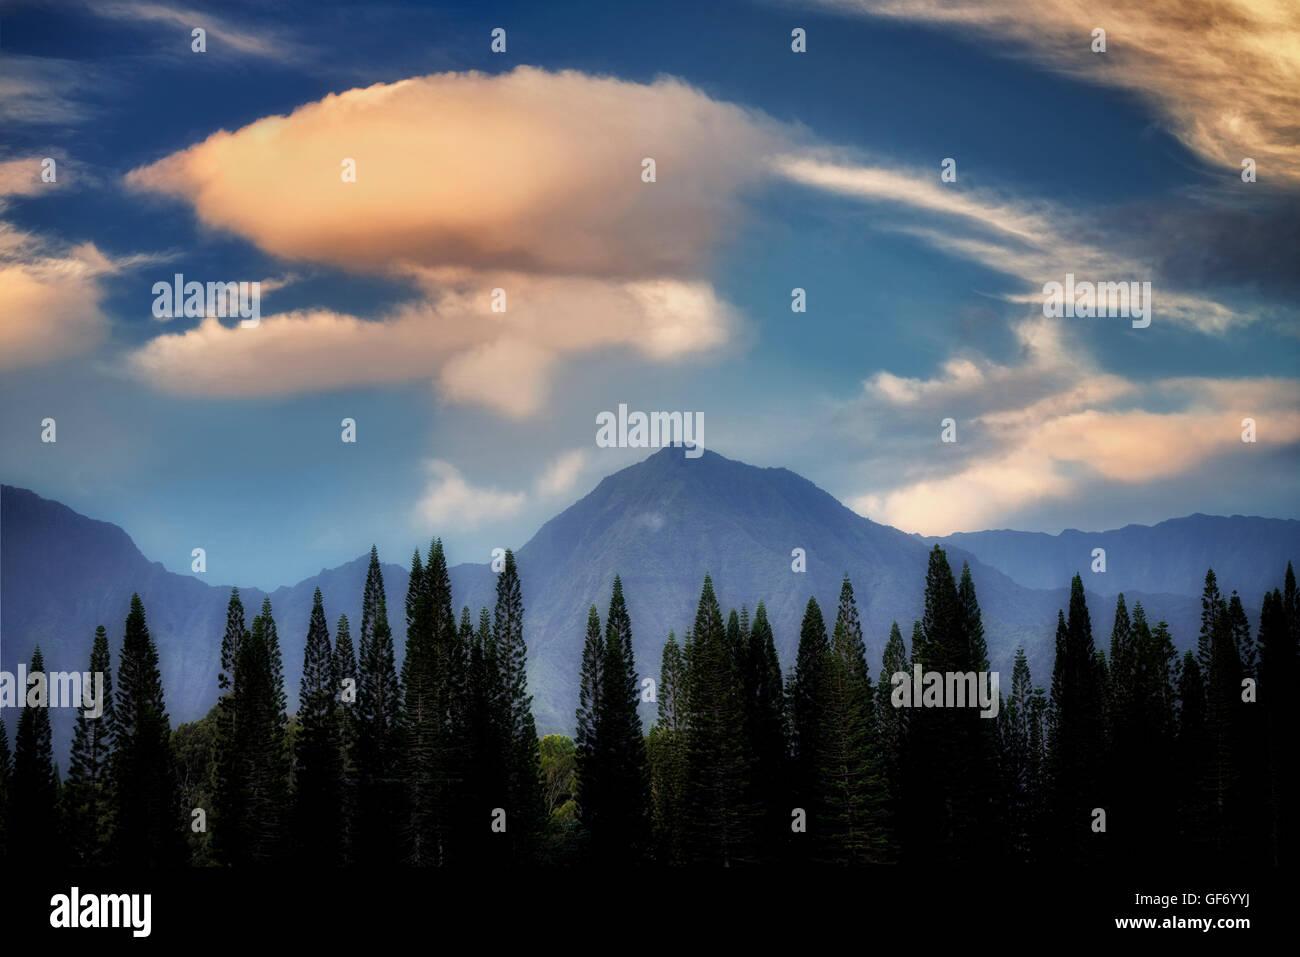 Norfolk Island Pines and mountains with sunrise. Kauai, Hawaii - Stock Image